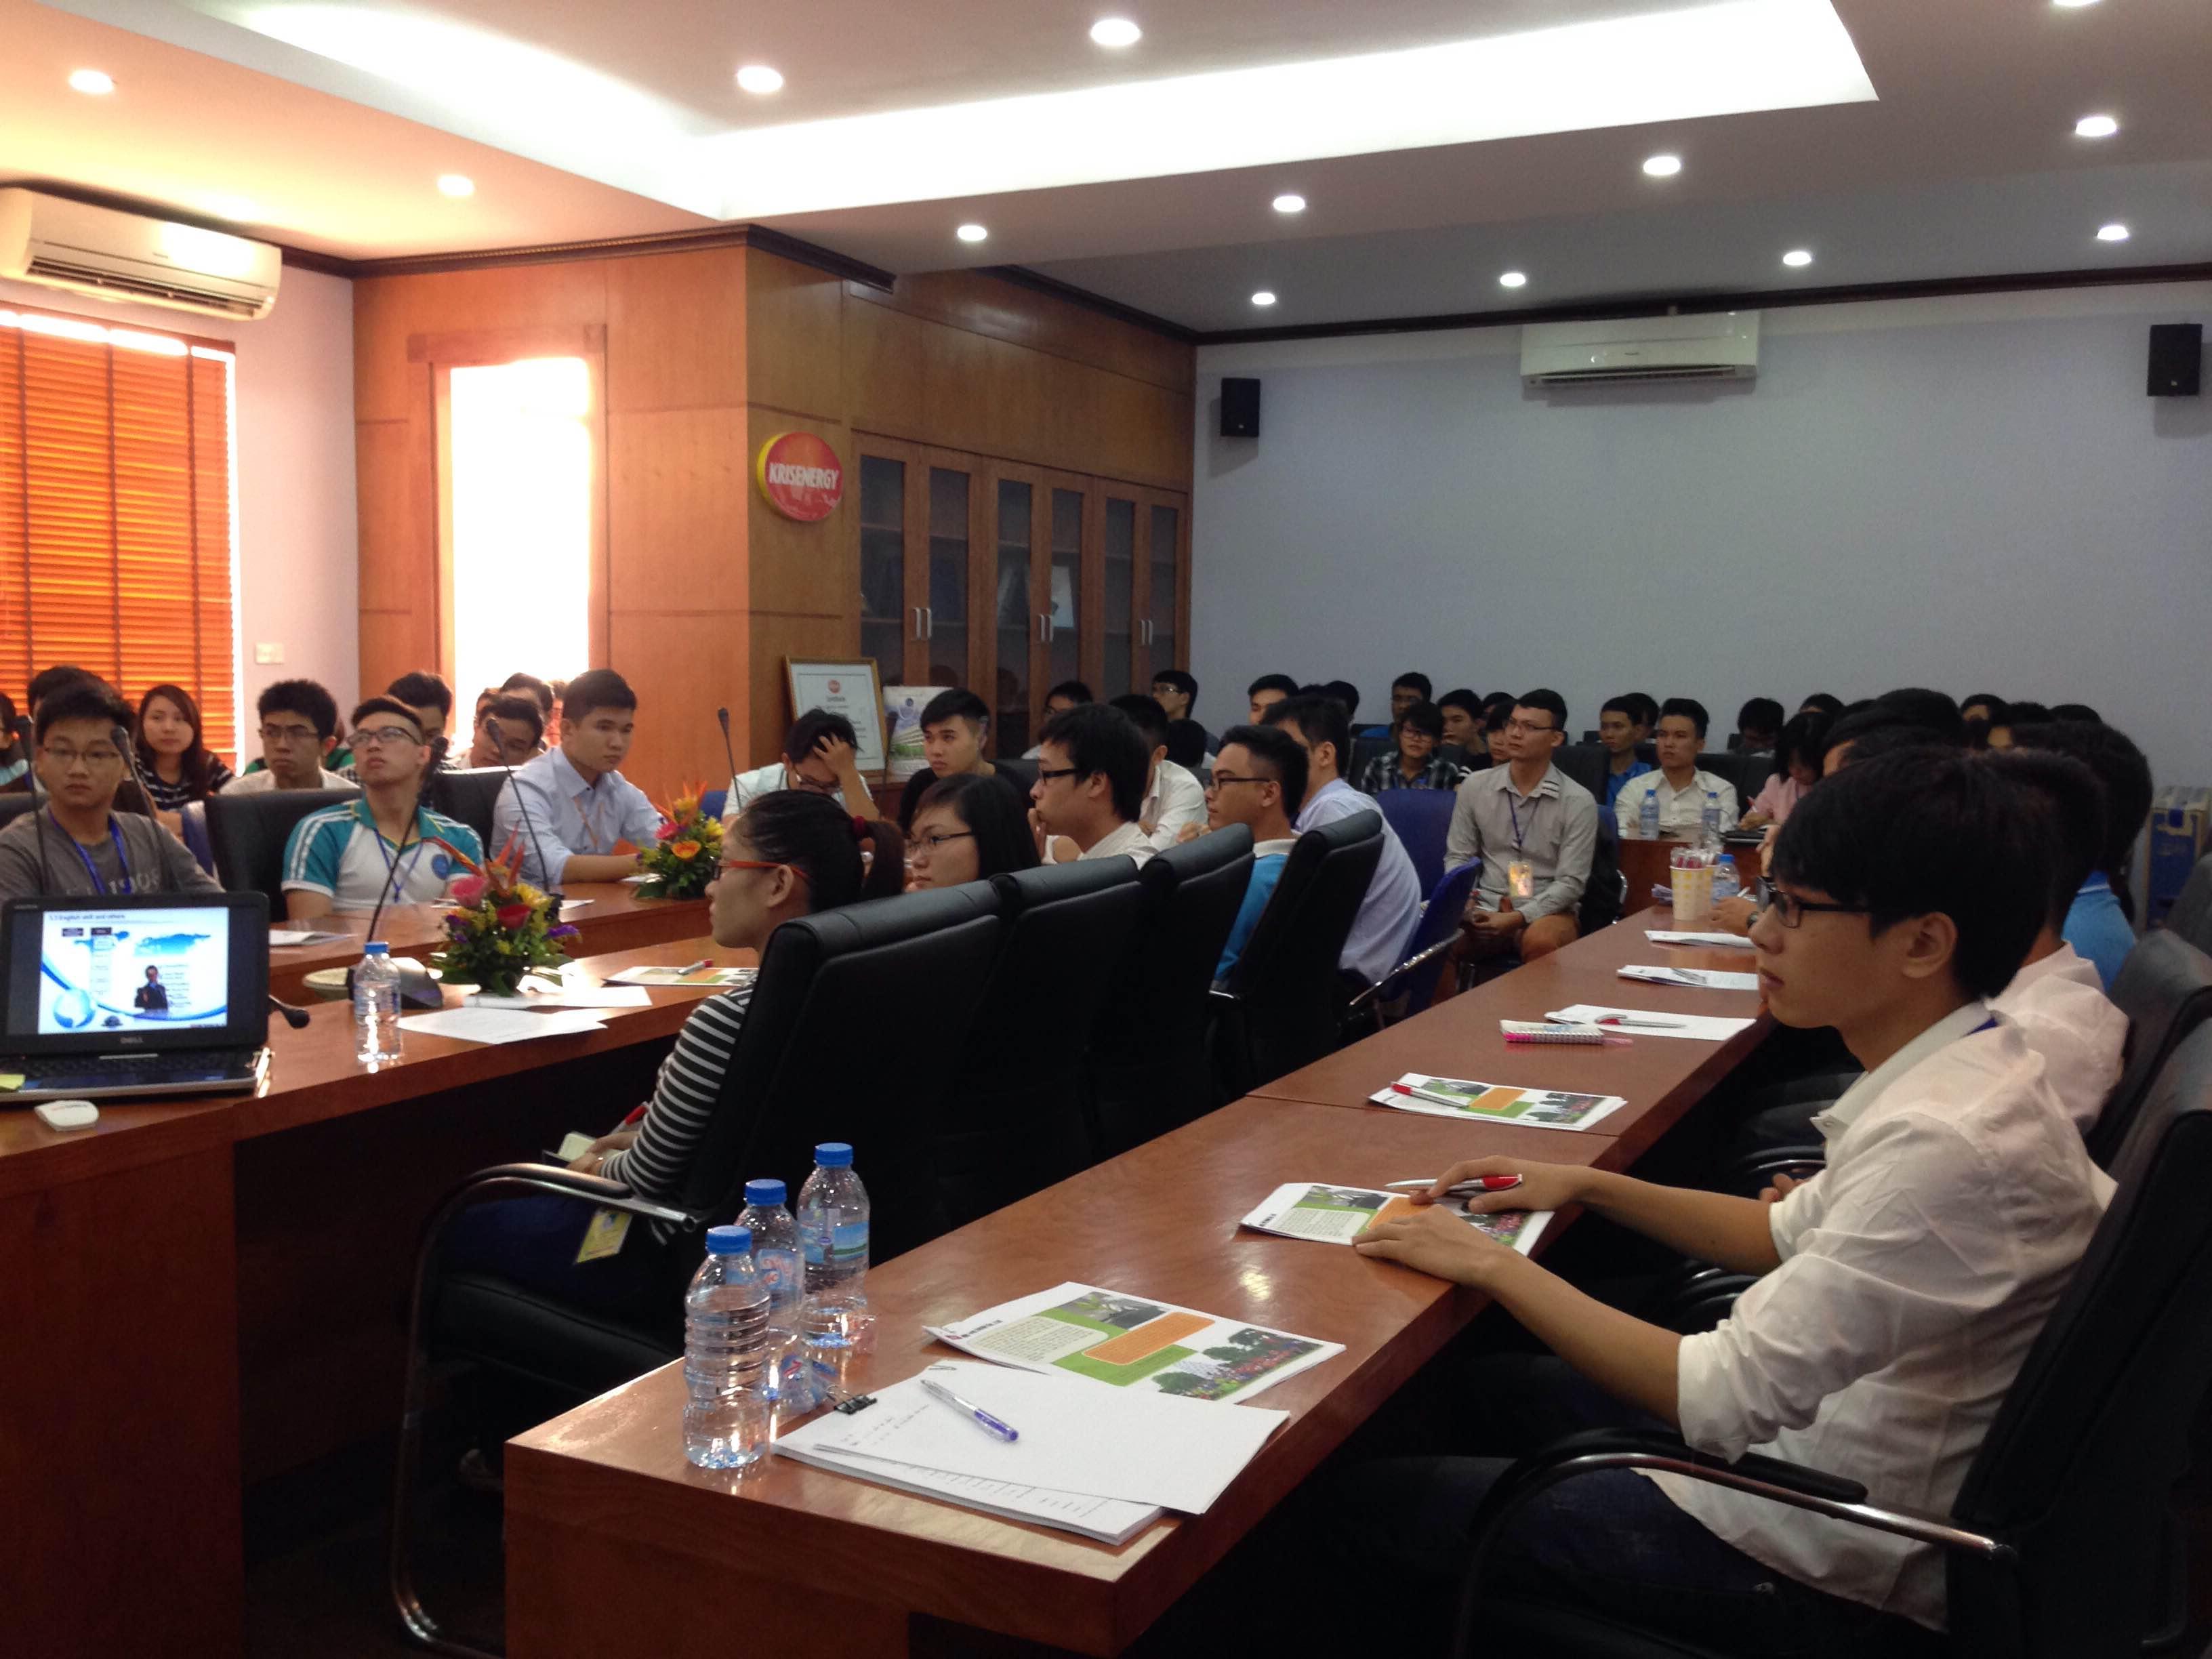 Jgc Vietnam Held A Career Orientation Seminar At Hanoi University